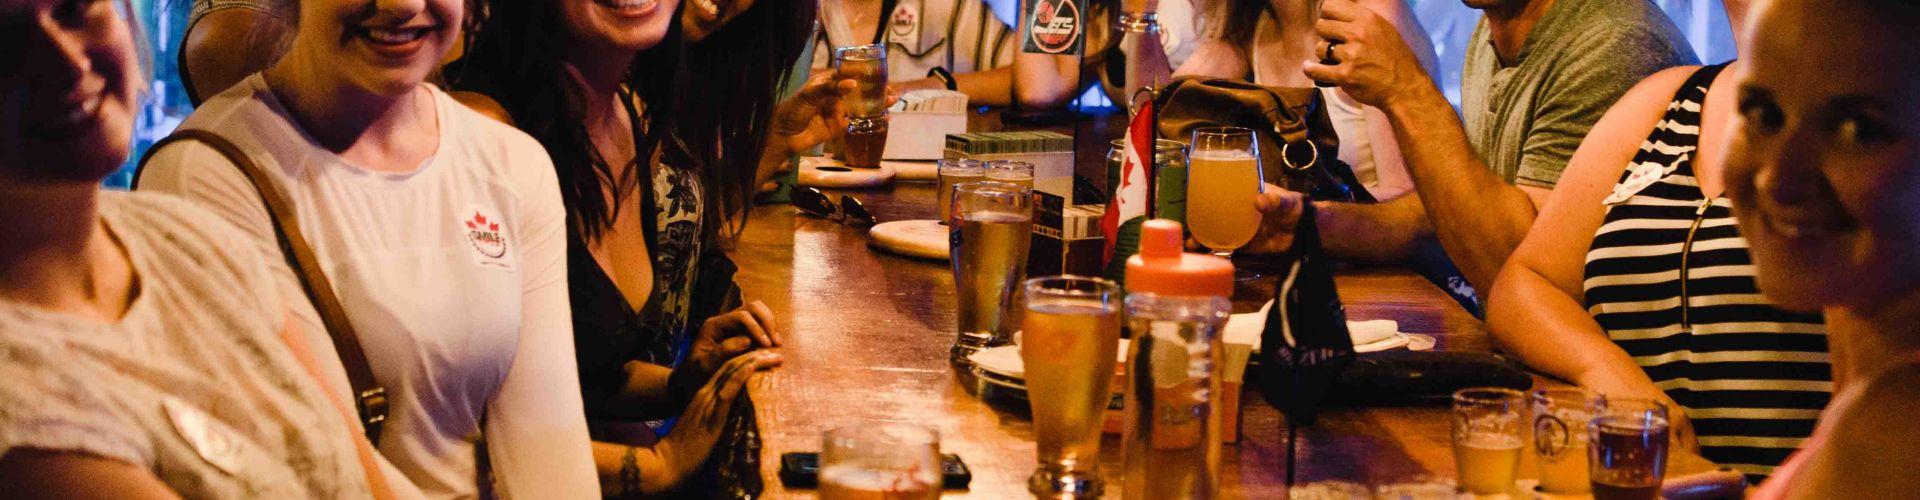 Things To Do Downtown Kelowna Micro Brewery Tour